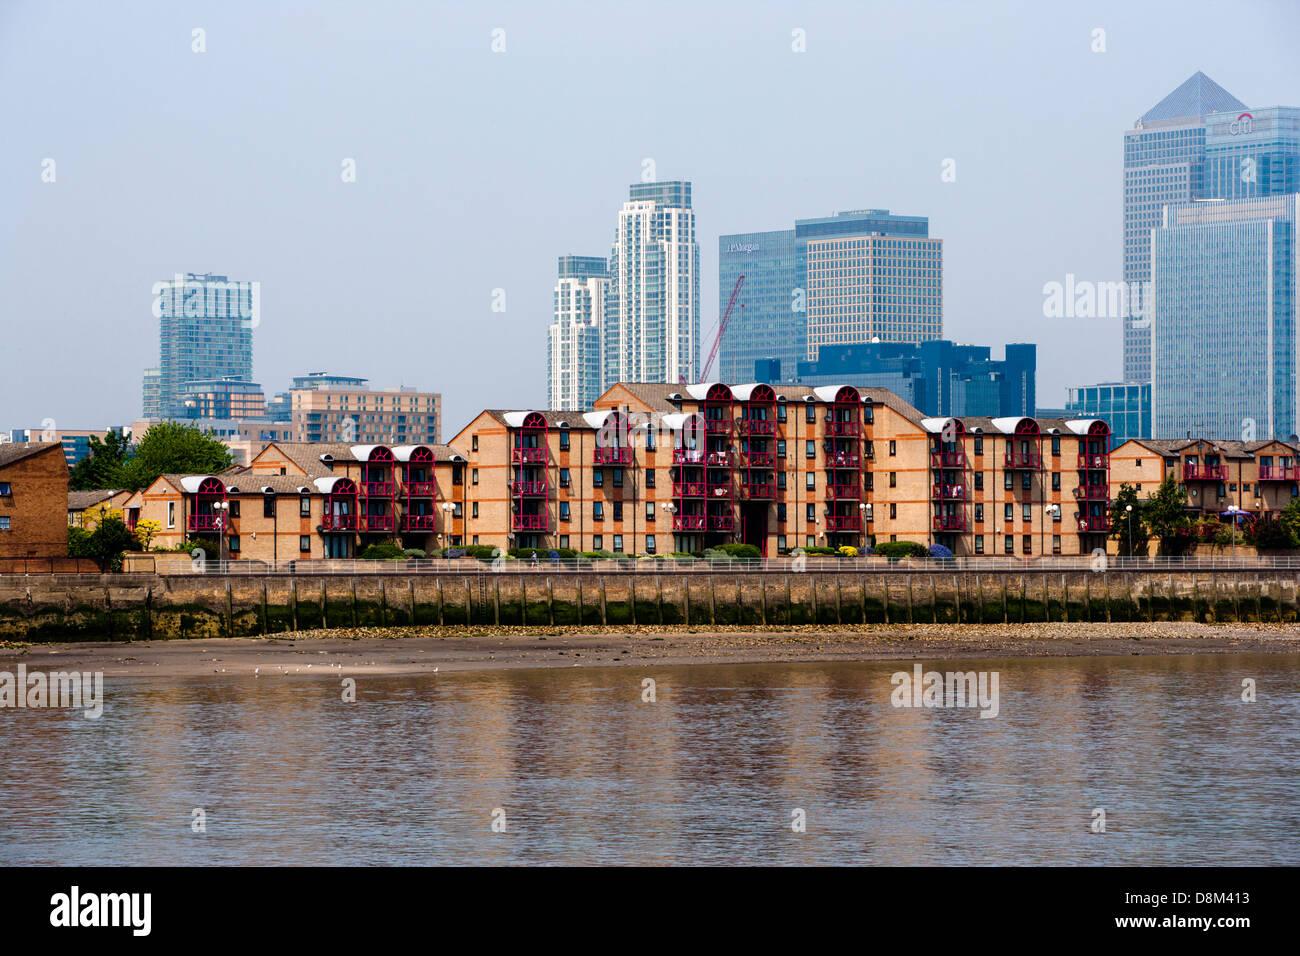 Caledonian Wharf Isle of Dogs London E14 - Stock Image